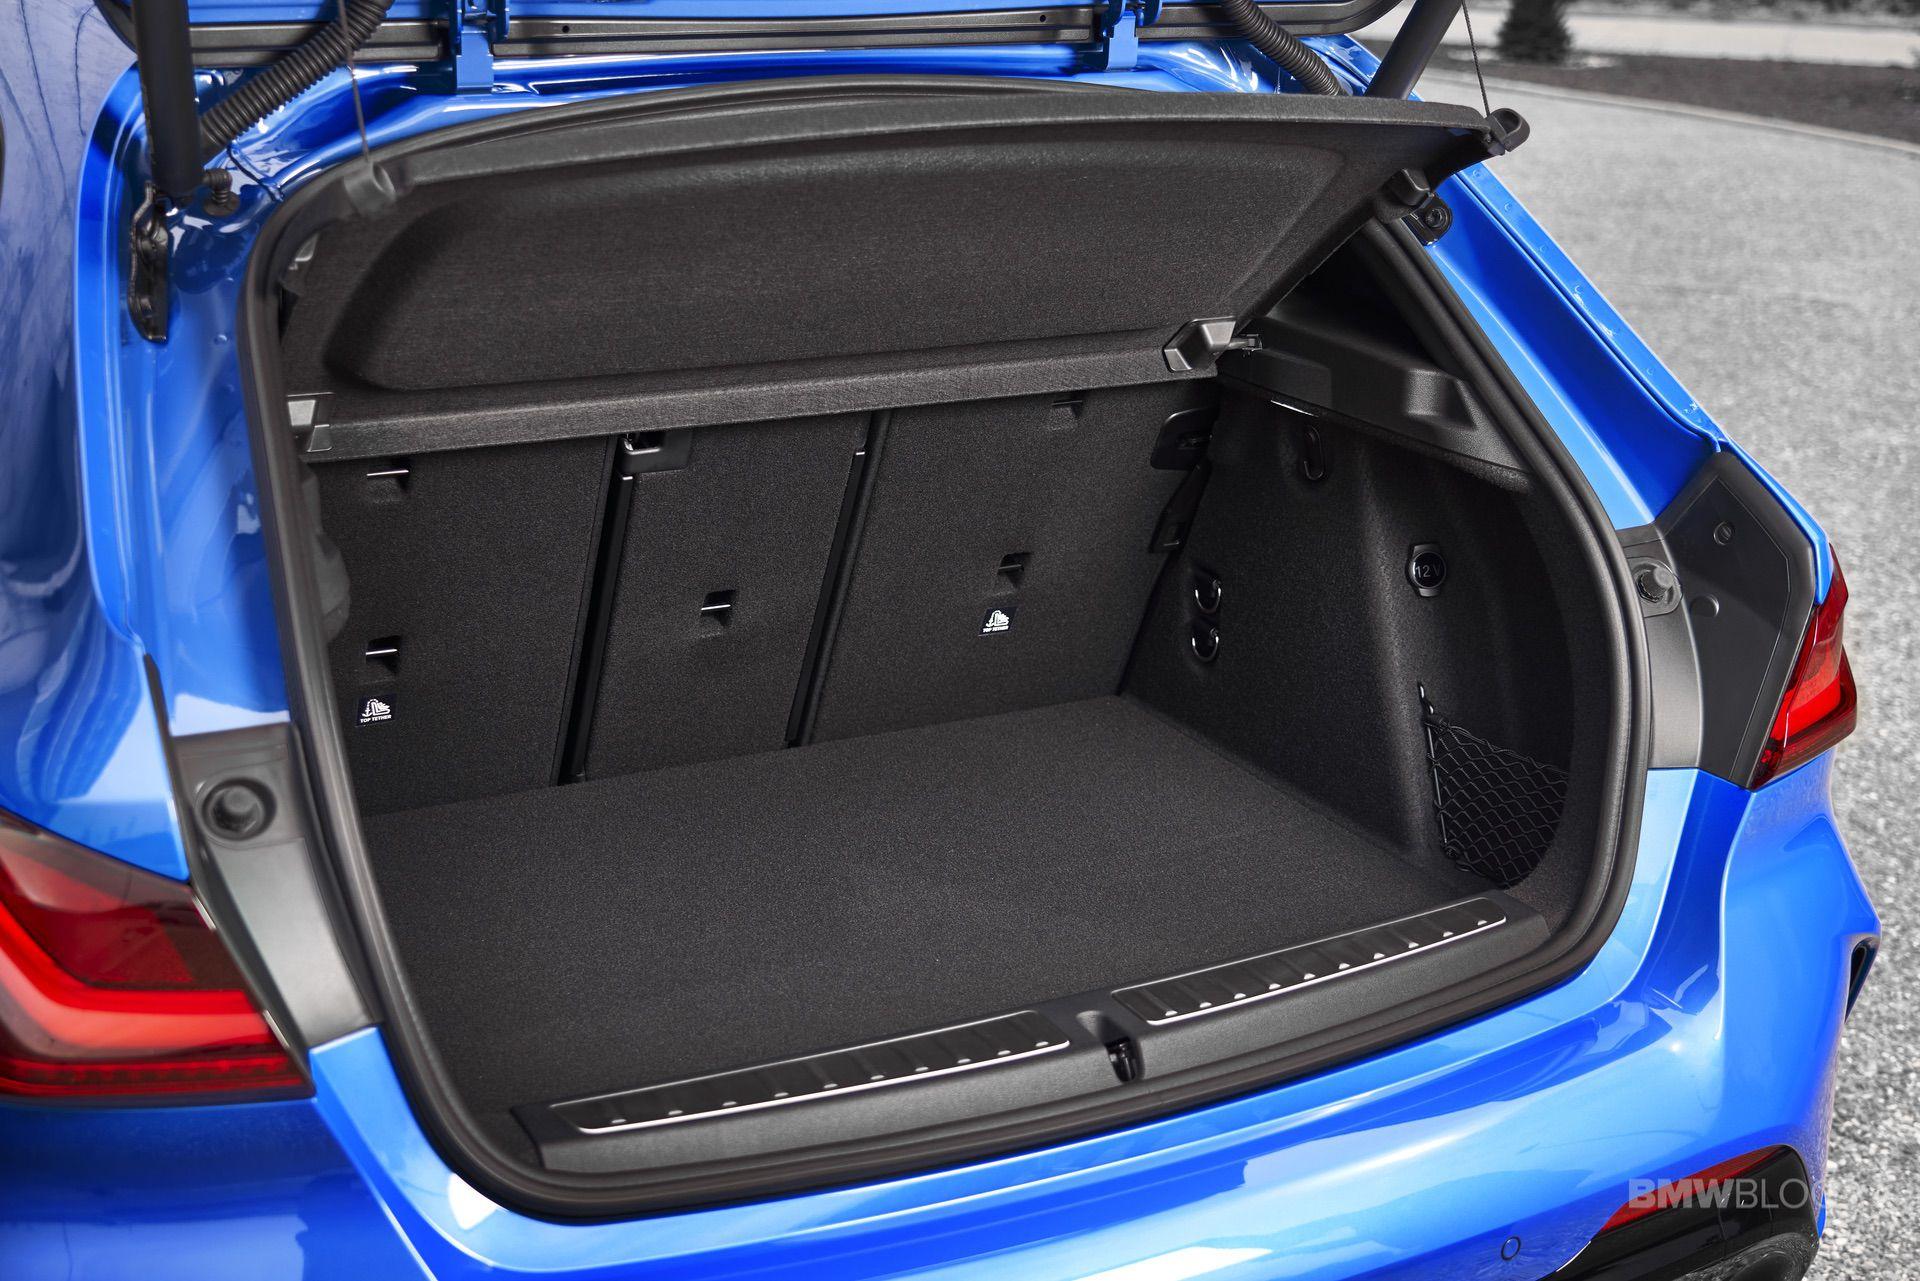 2020-BMW-M135i-xDrive-Misano-Blue-32.jpg